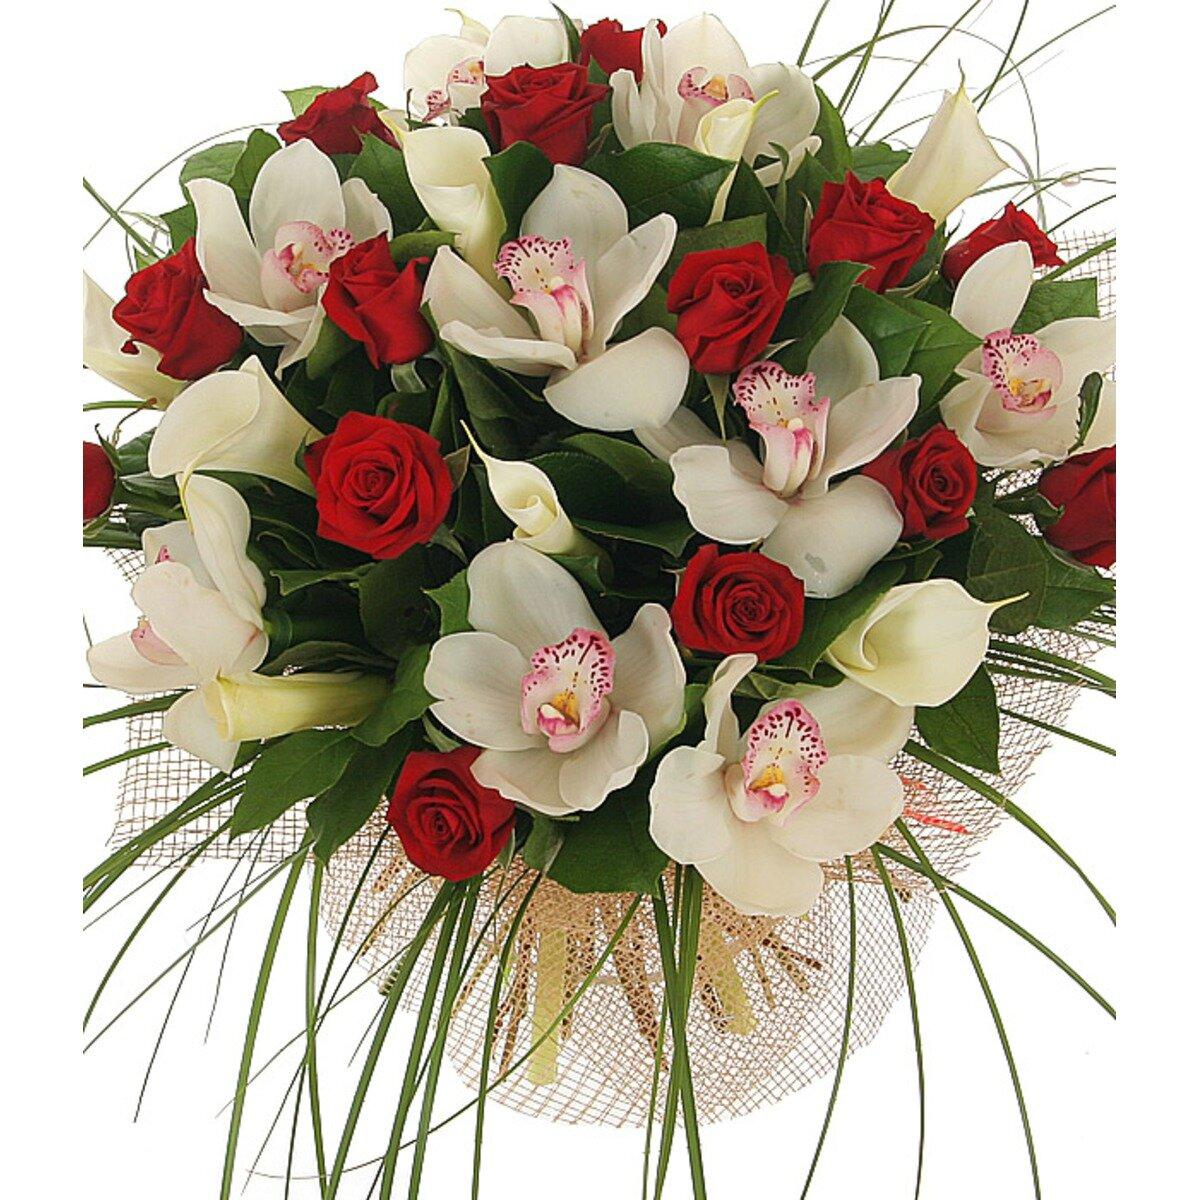 Заказ цветов орхидеи через интернет